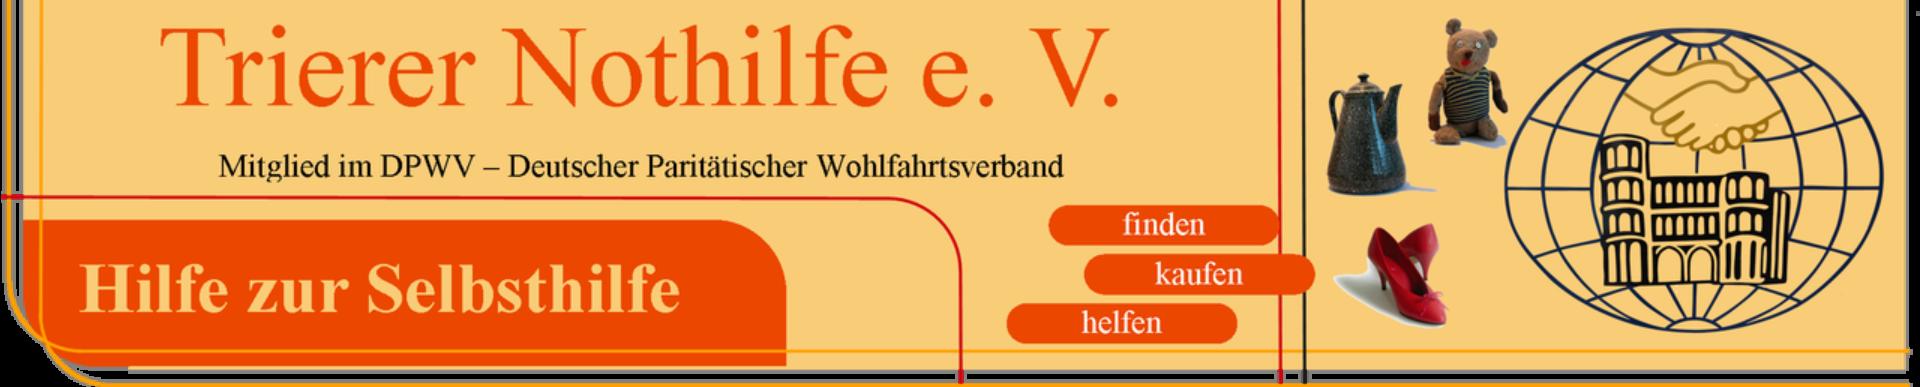 Trierer Nothilfe e. V.